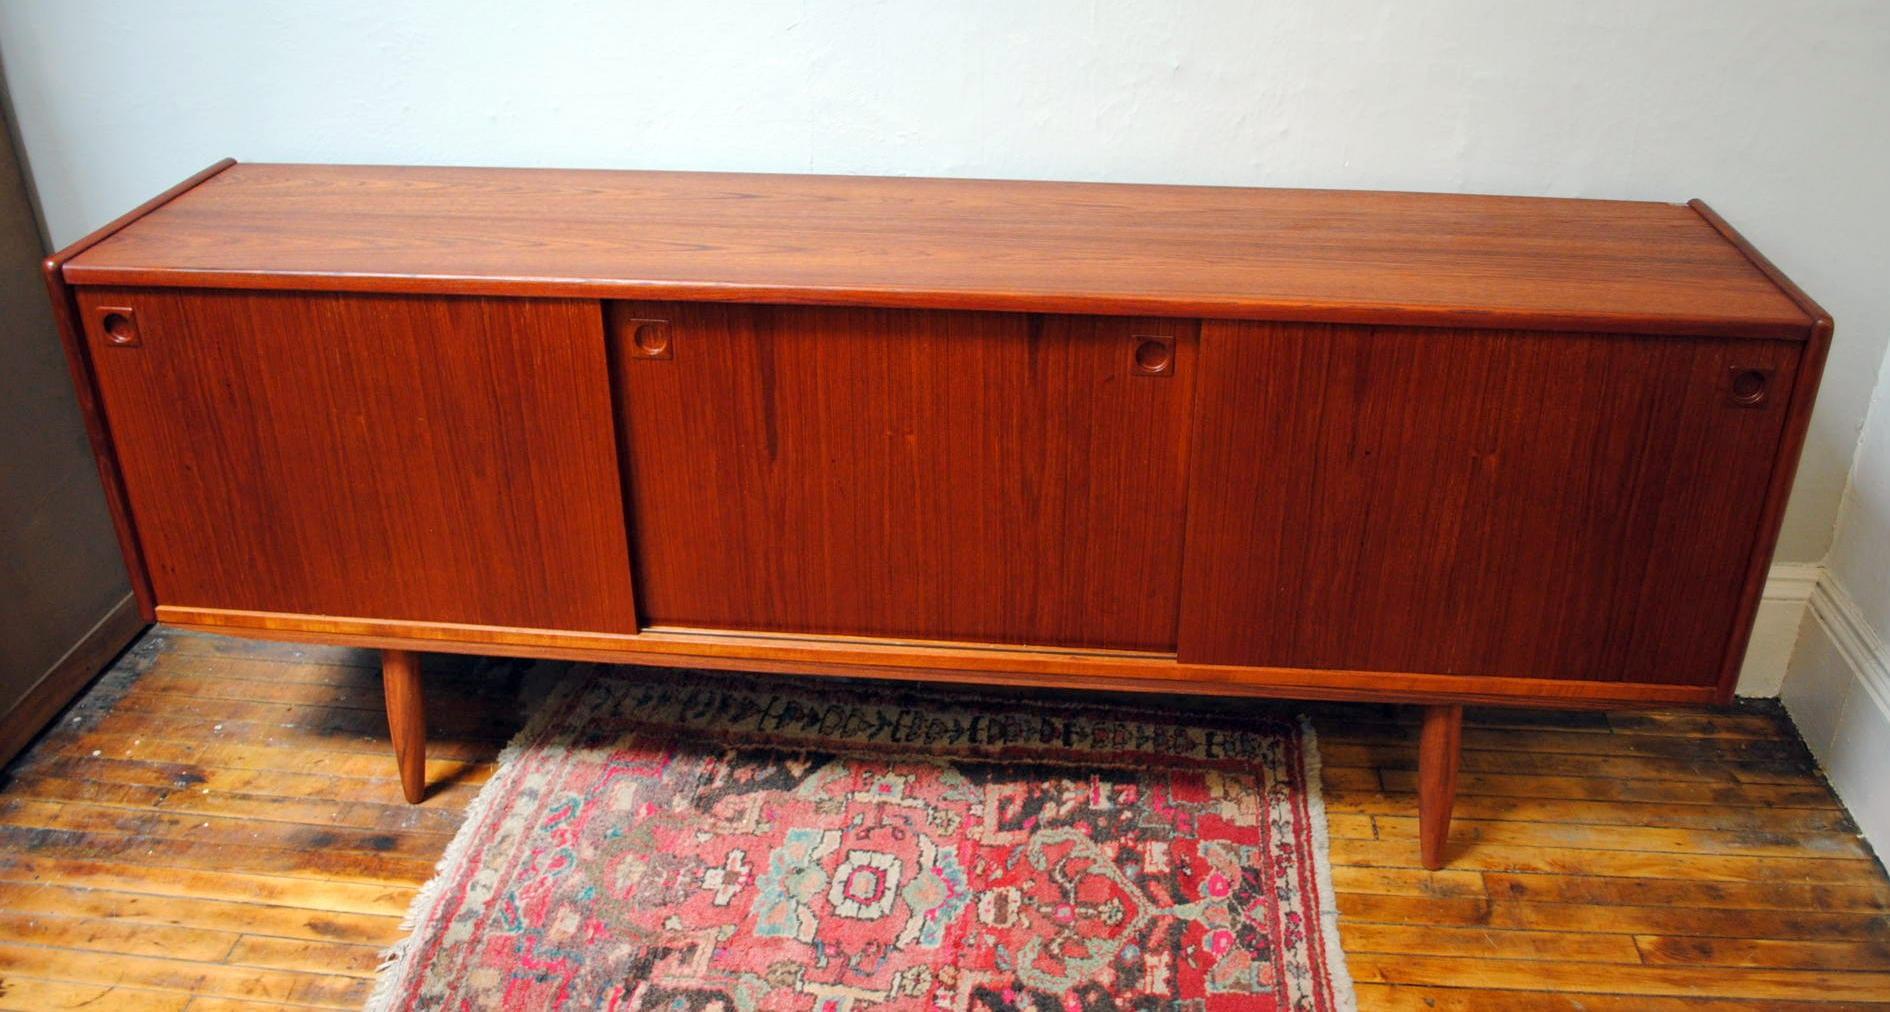 1960s Danish Credenza : Sold oak sideboard credenza s danish u sweden antique